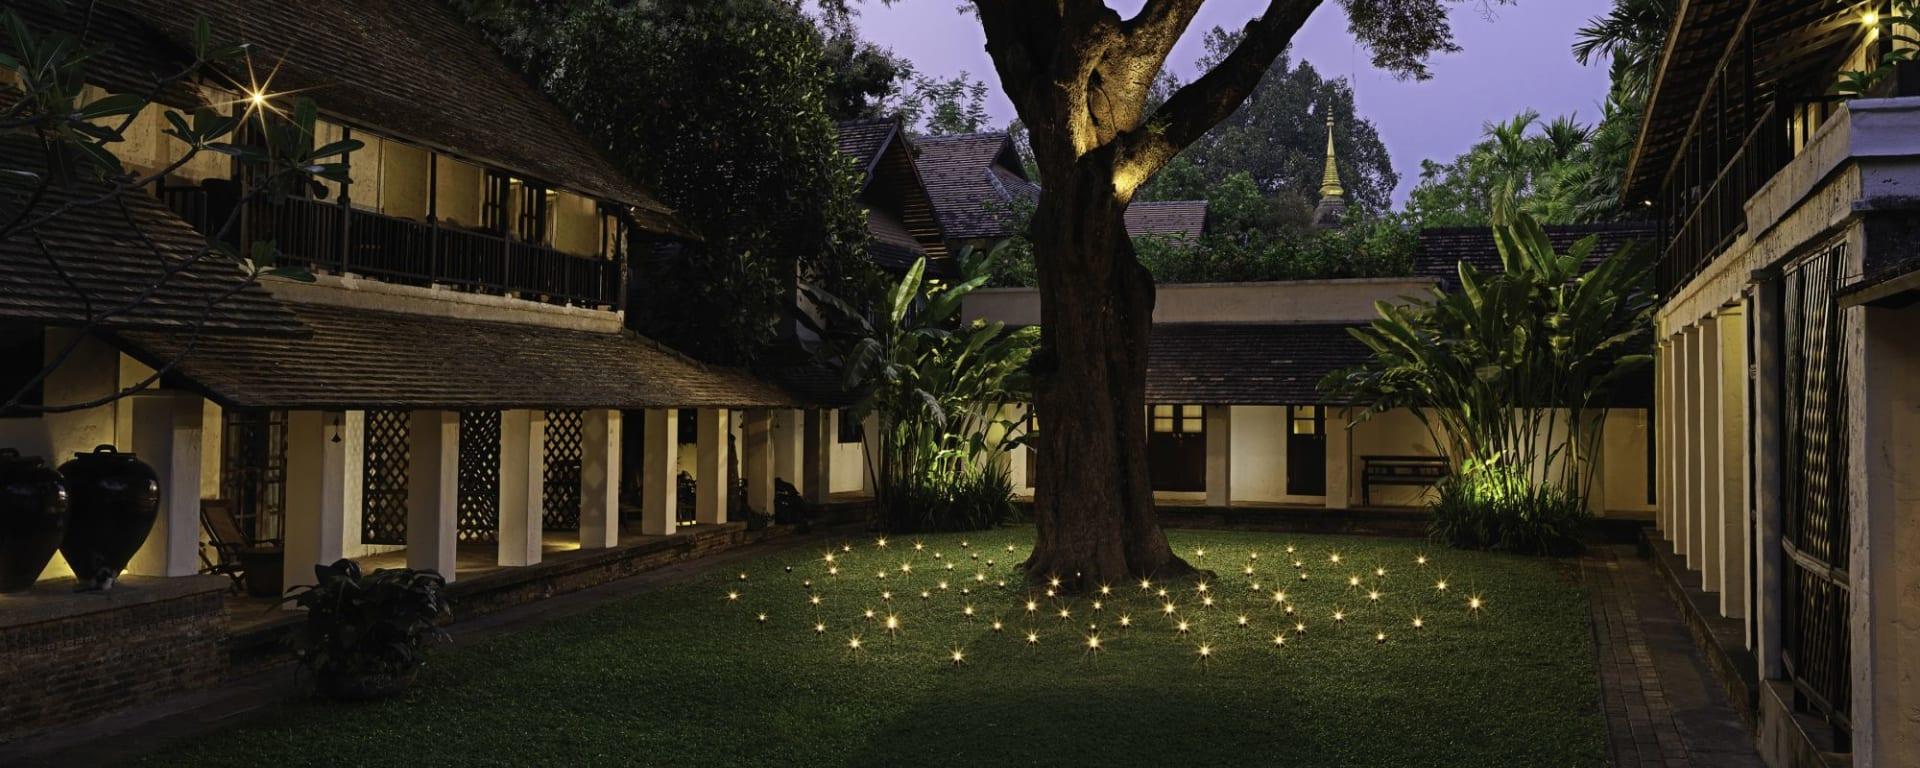 Tamarind Village in Chiang Mai: Peaceful Tamarind Courtyard (Evening)